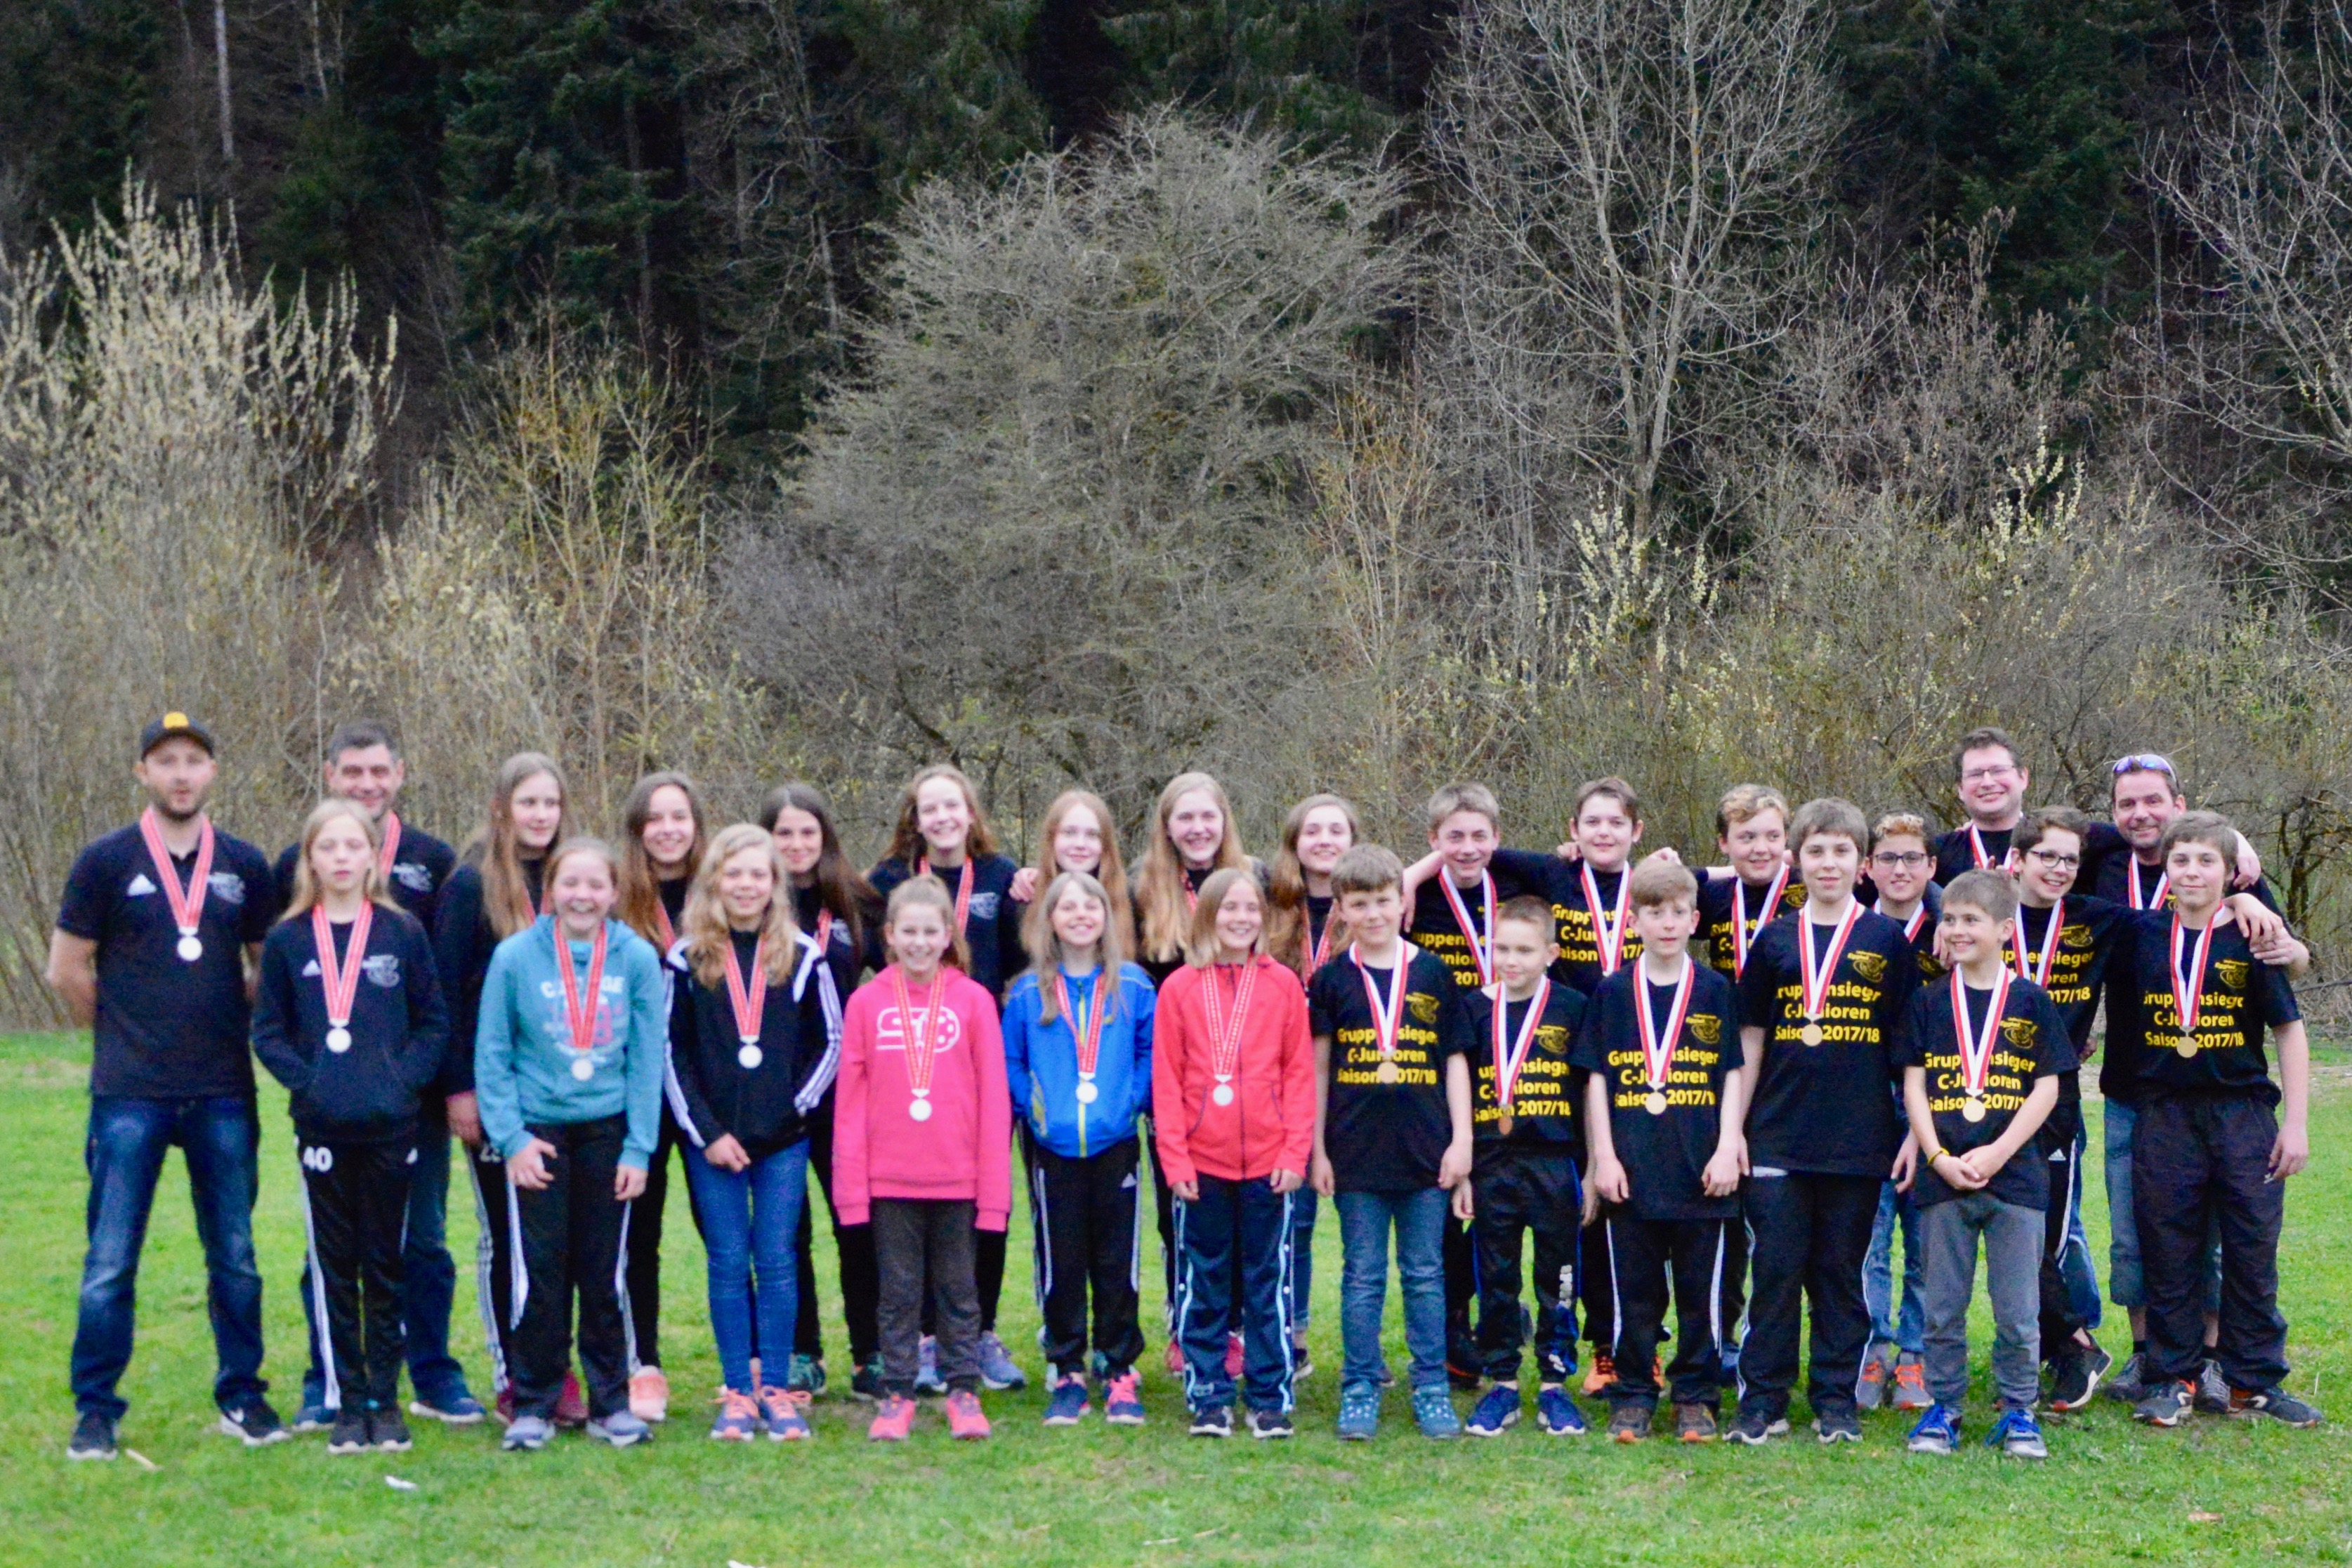 Juniorinnen C - Finalrunde Empfang im Eggiwil Saison 2017/18